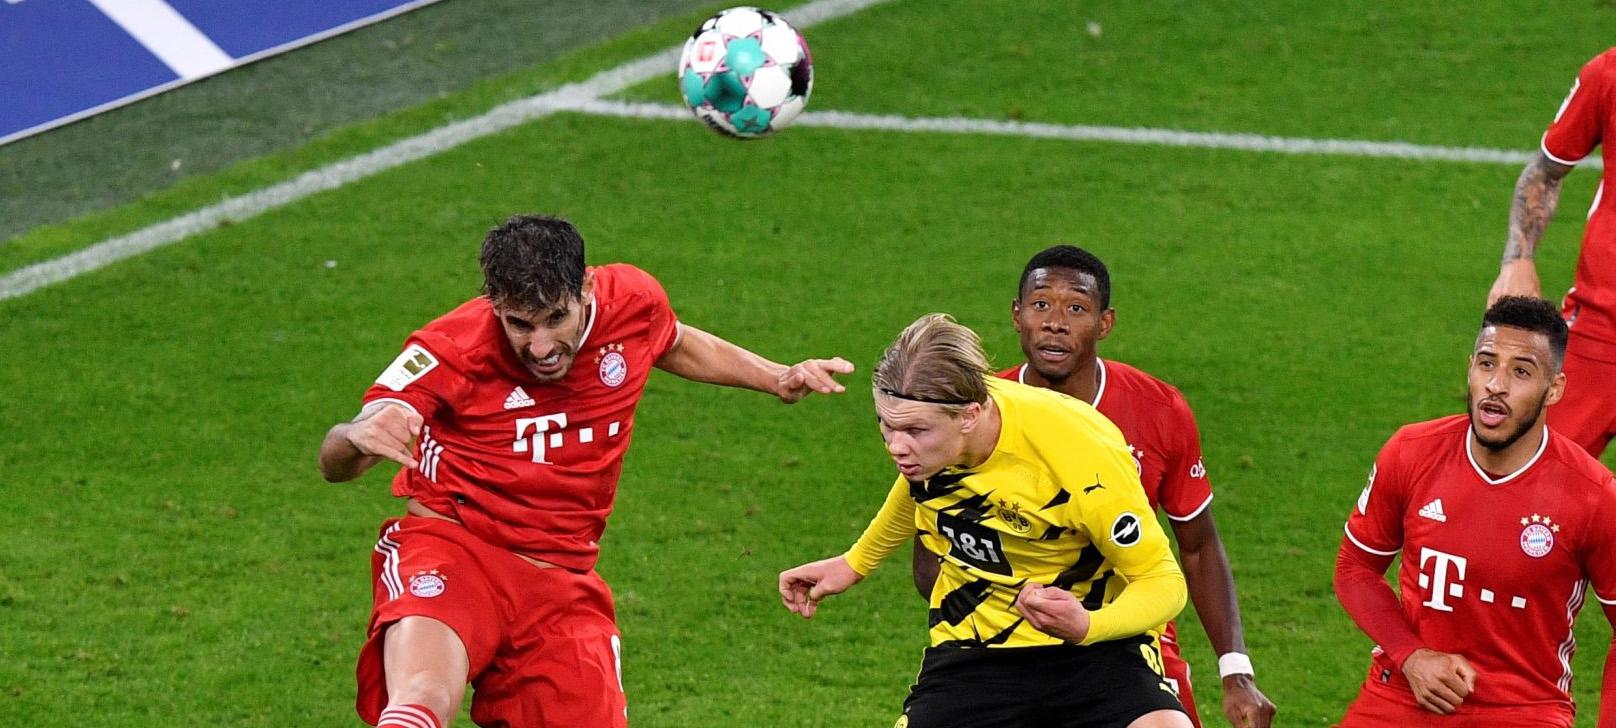 Classy reds overcome Dortmund (2-3)